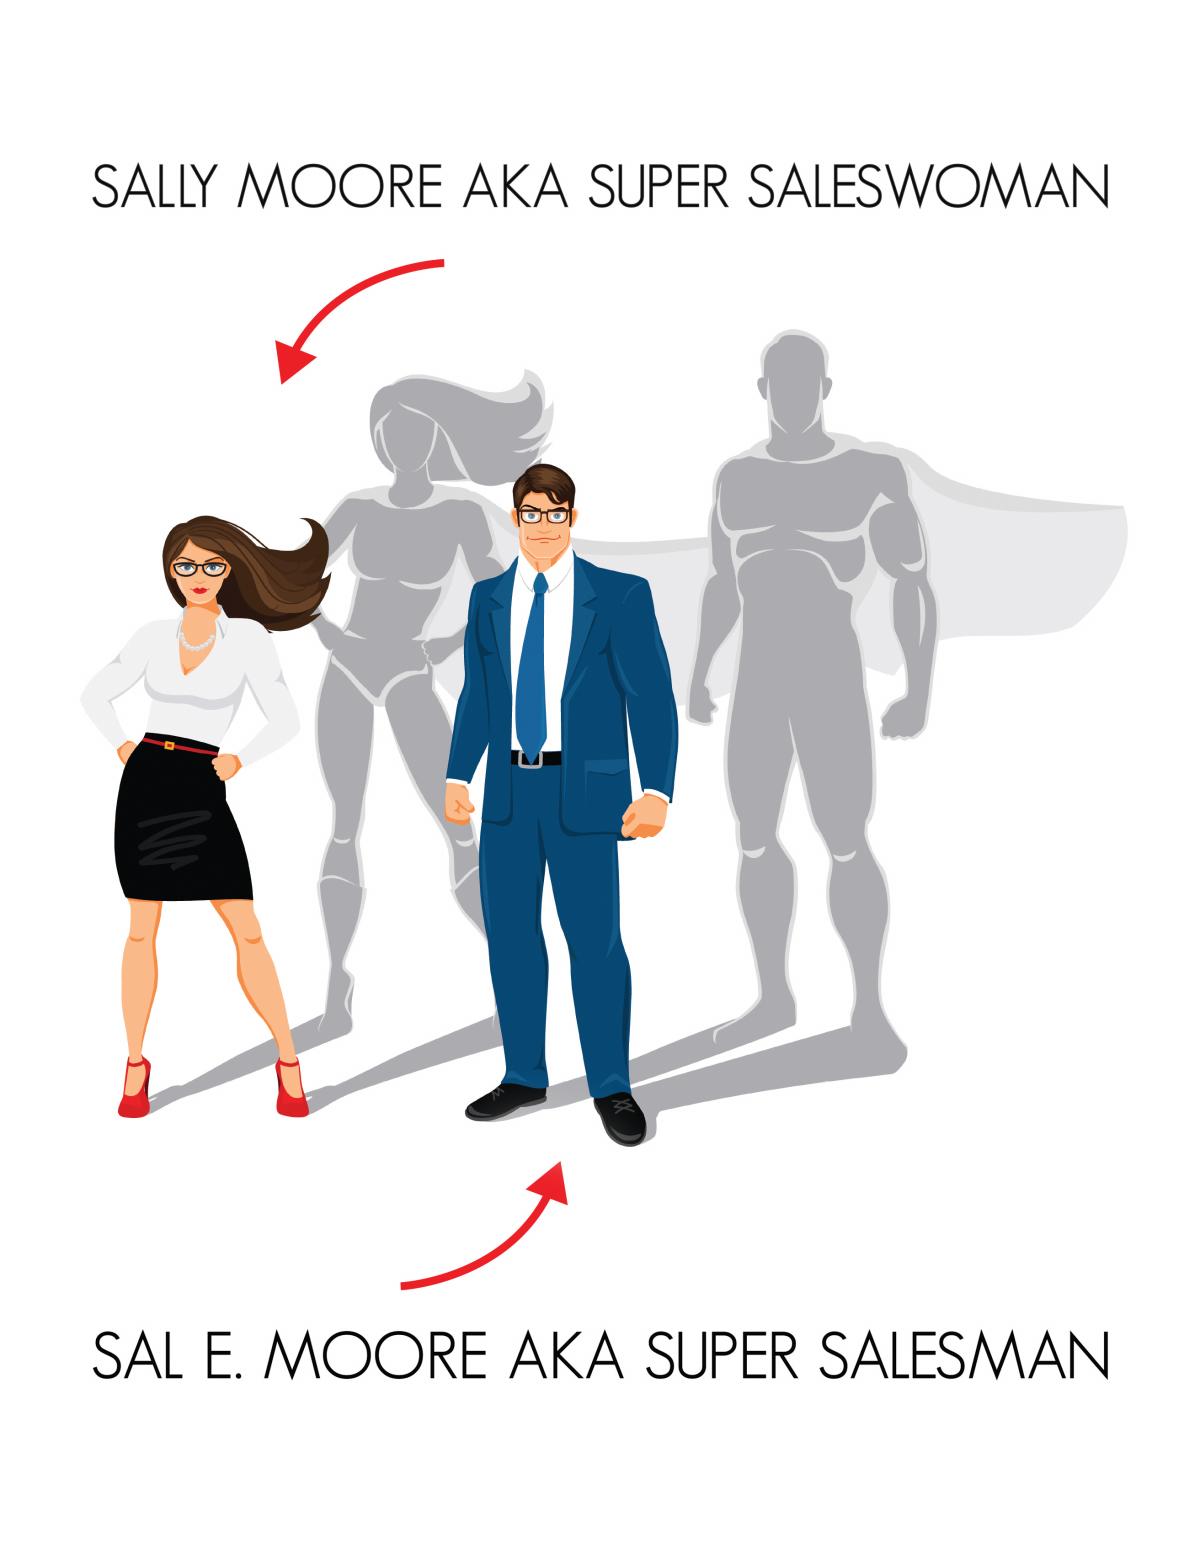 Super Salesman / Super SalesWoman